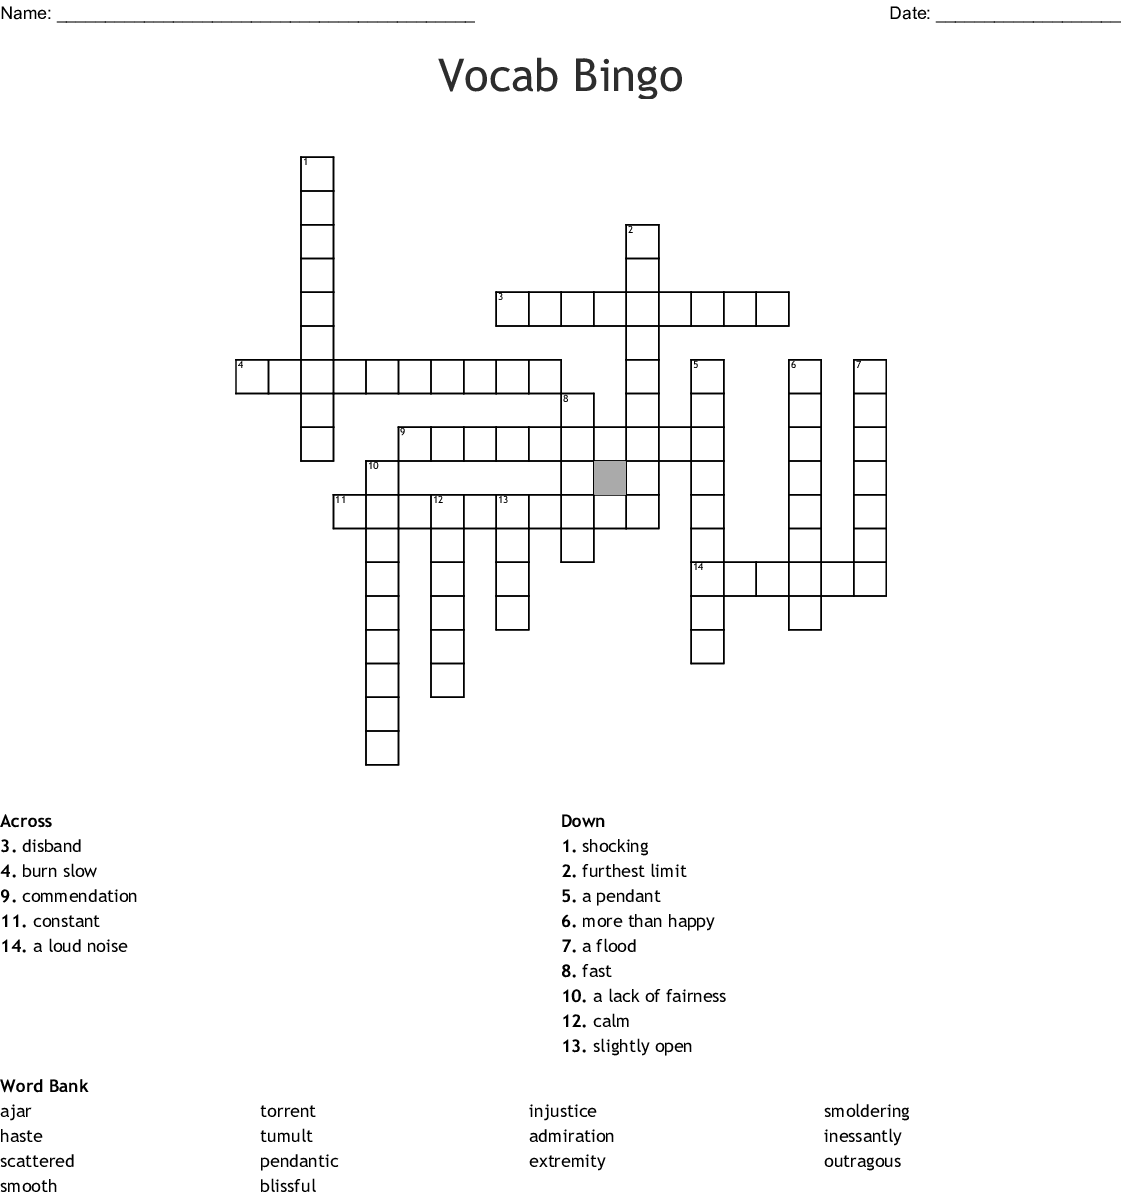 Vocab Bingo Crossword